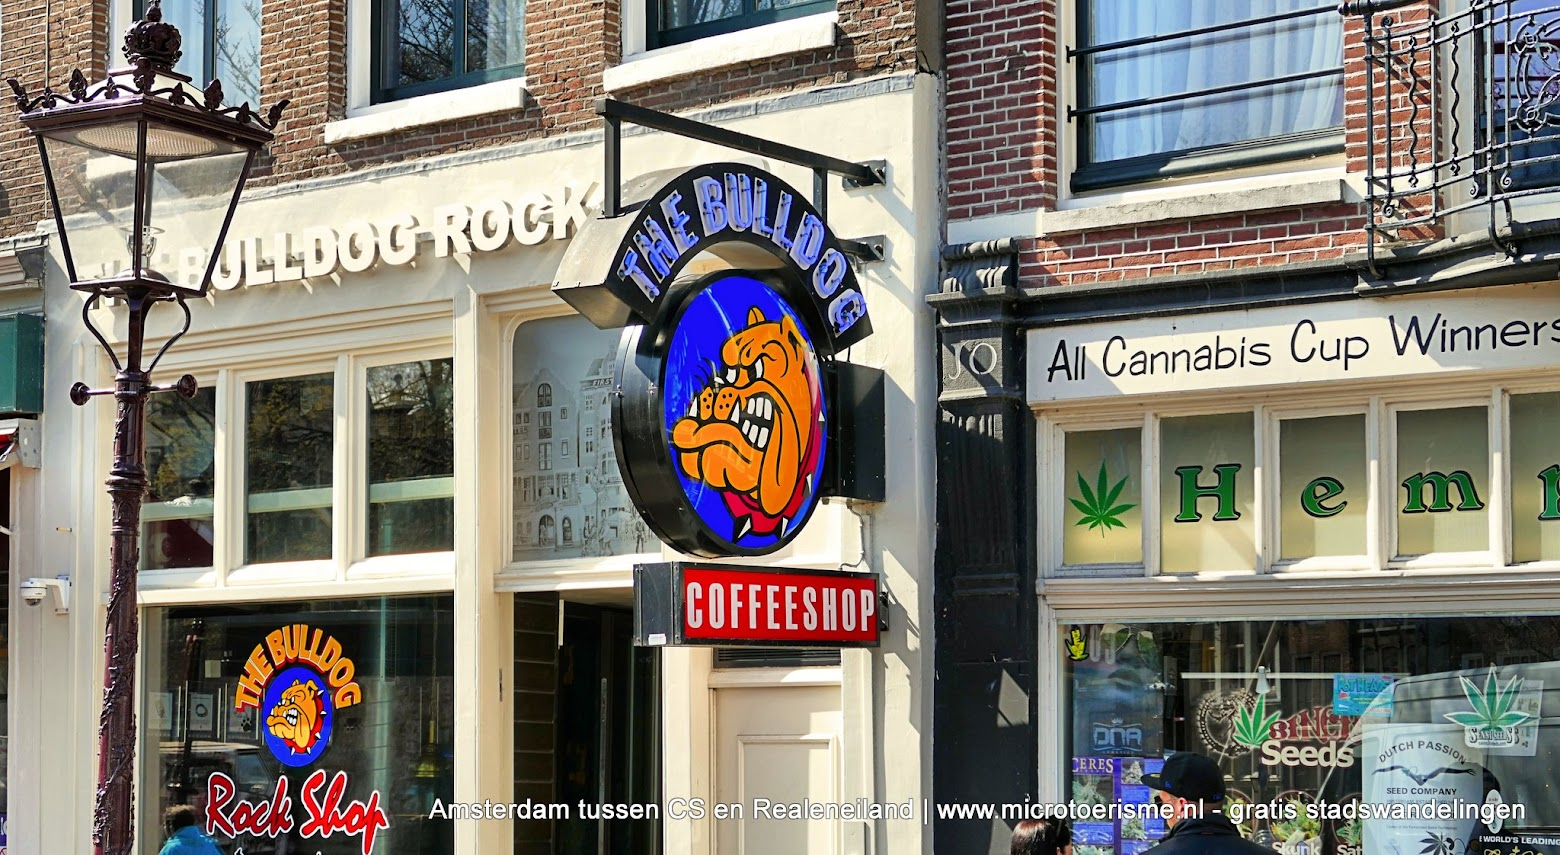 Aangeboden door: Stichting Microtoerisme InZicht Fotoblog Amsterdam coffeeshop Bulldog